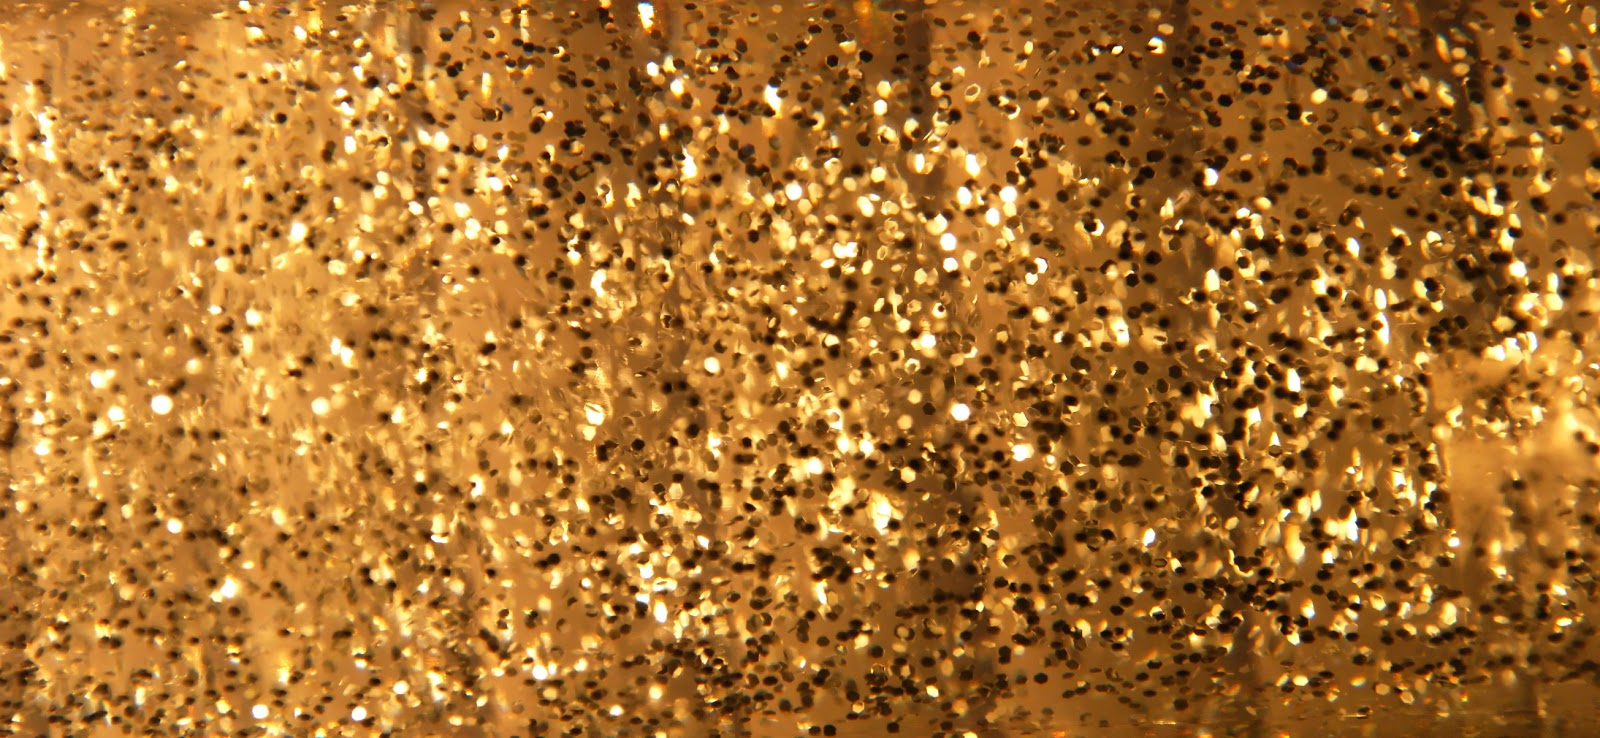 Gold Sparkle Backgrounds wallpaper wallpaper hd background desktop 1600x738